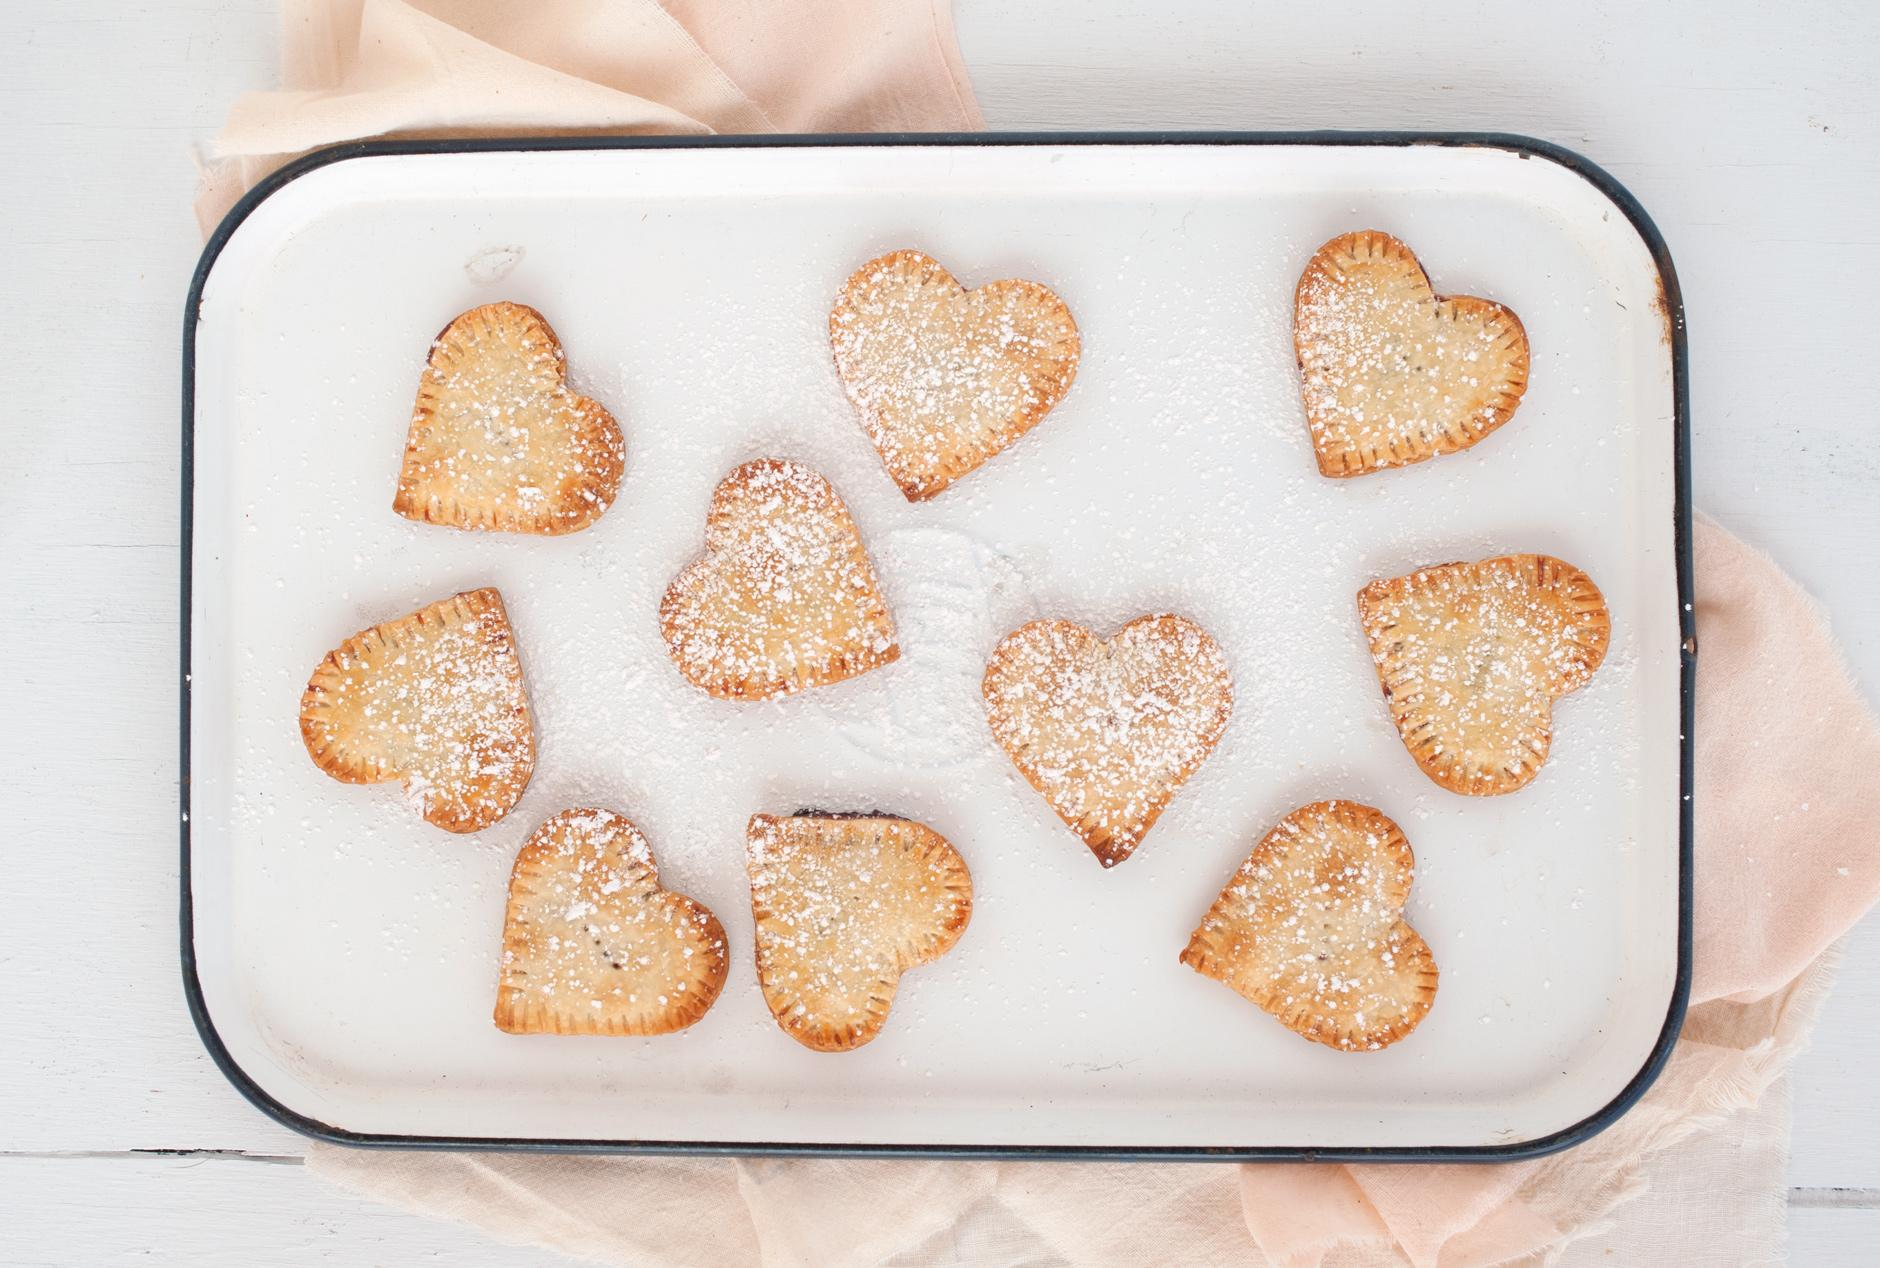 heart_pies_food_photography_1.jpg